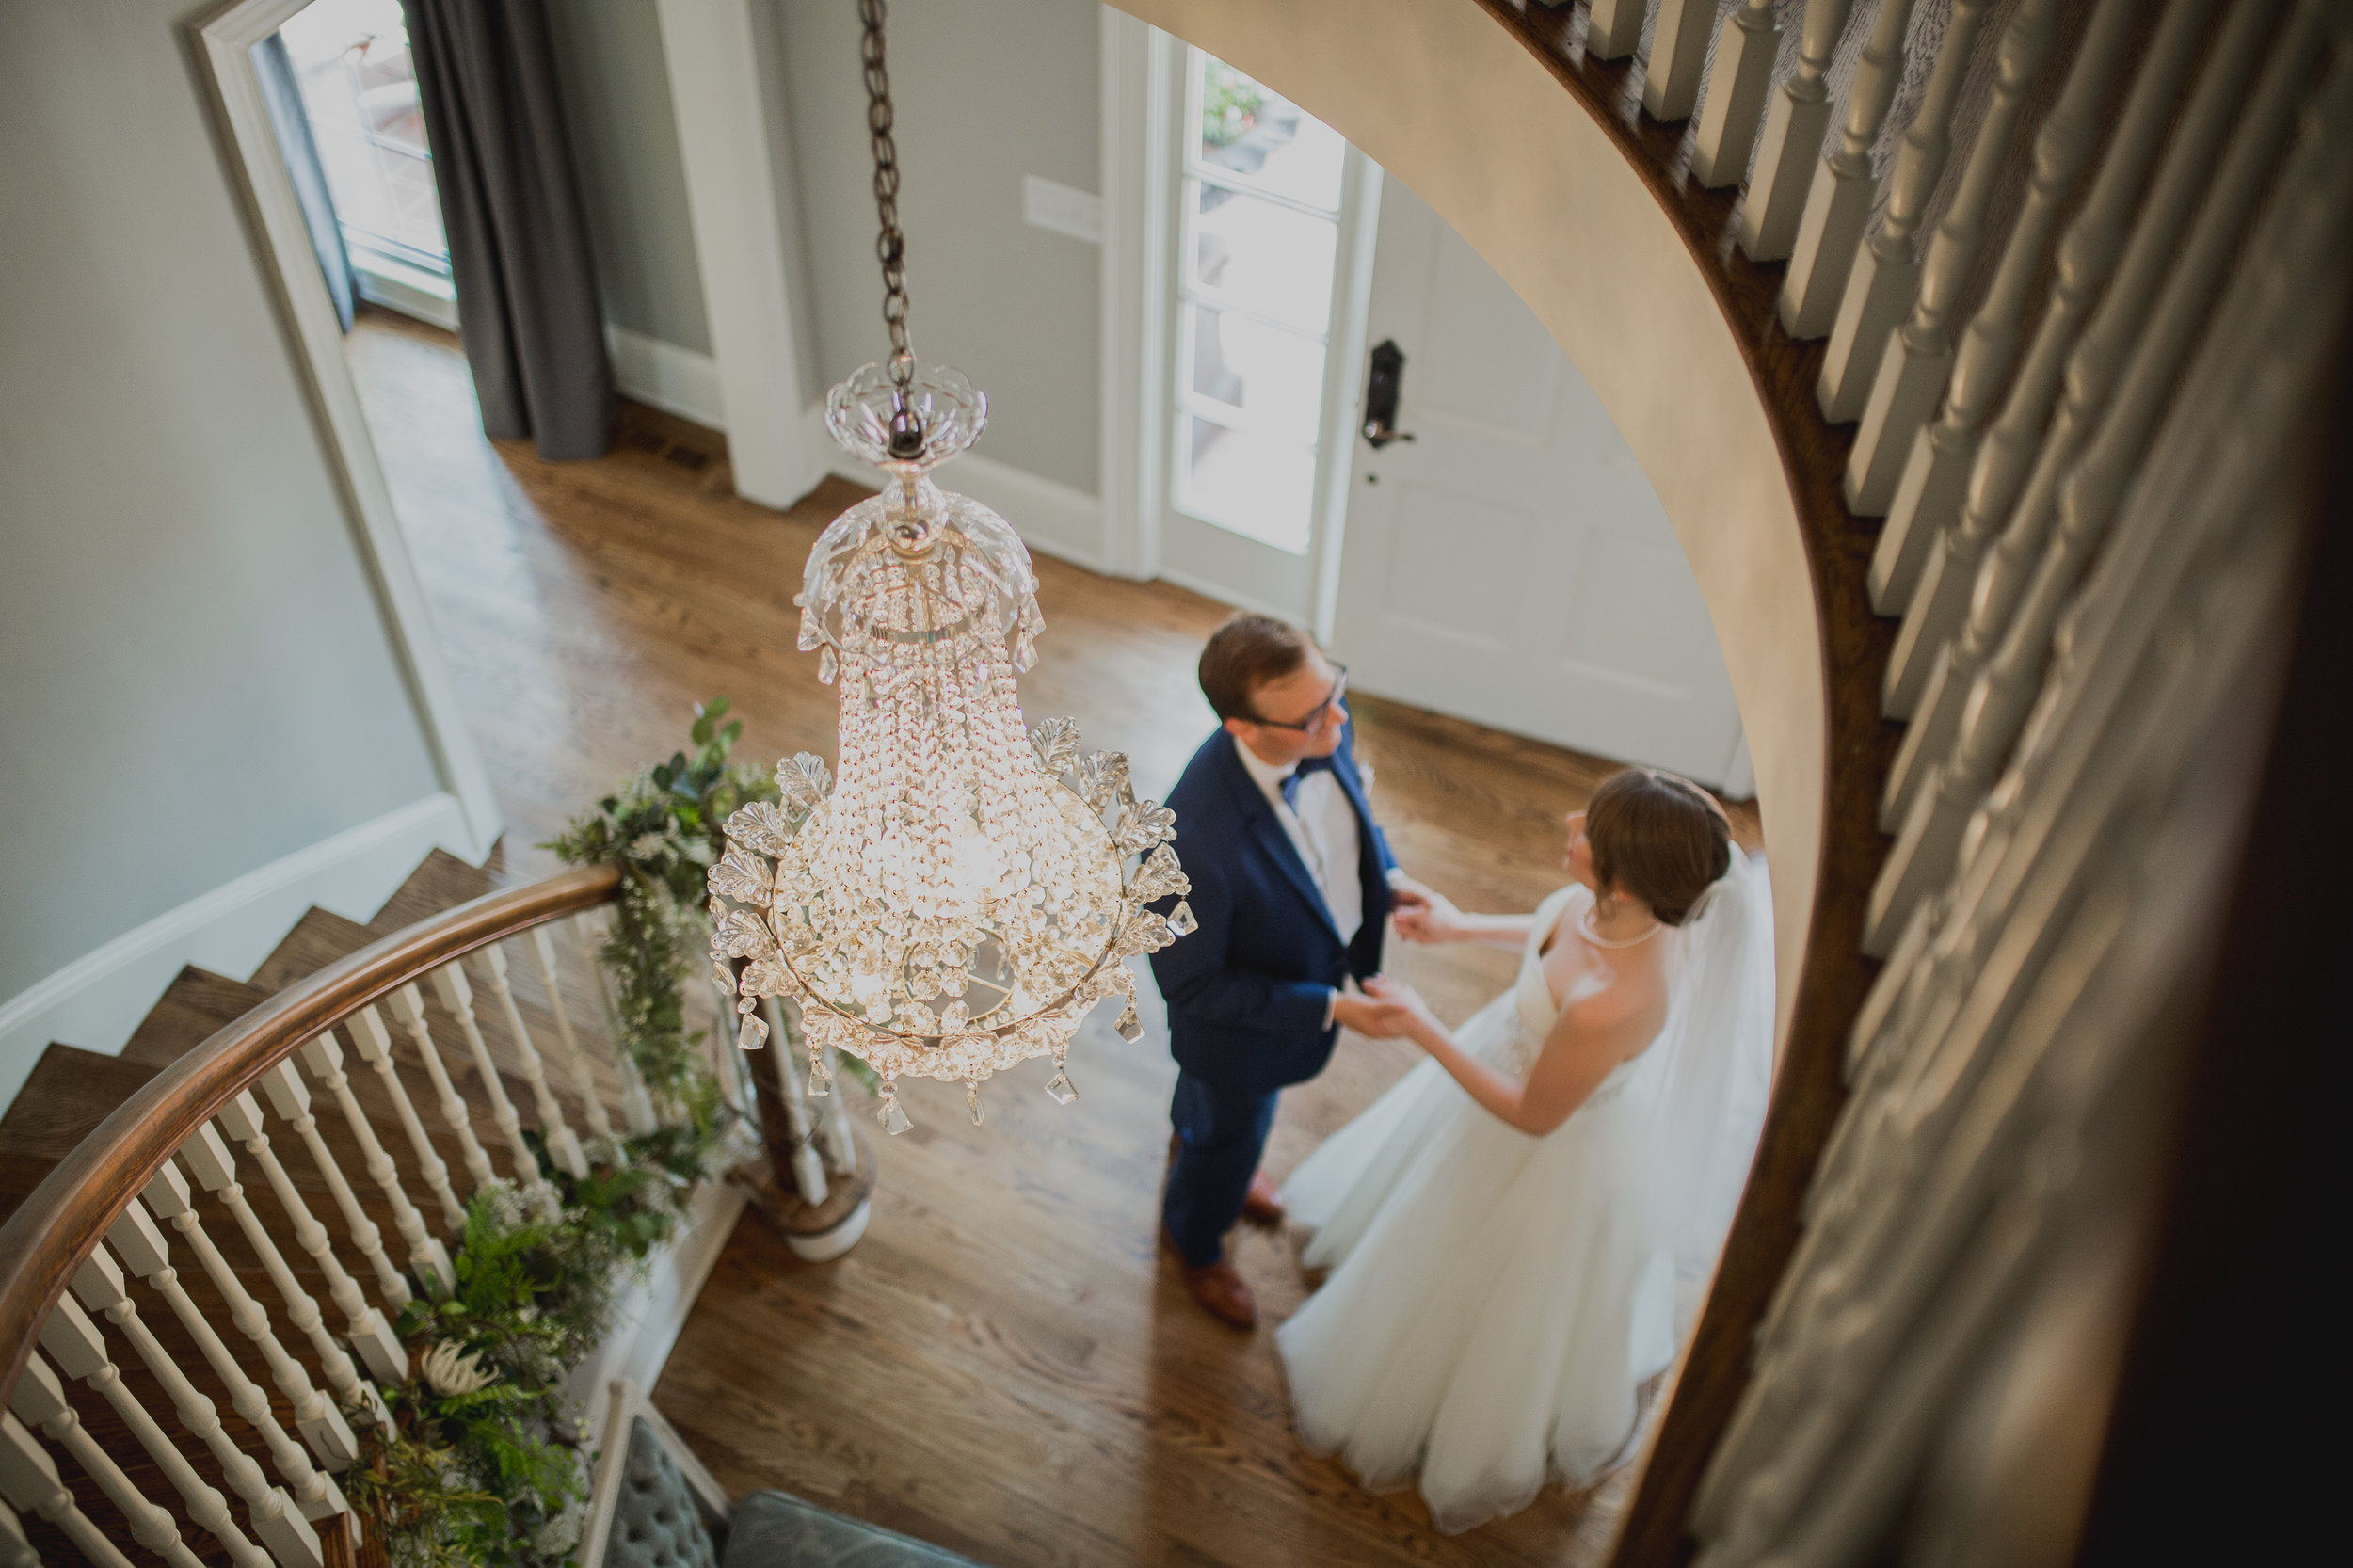 Farish-Cashwell Wedding-PREVIEW-4.jpg